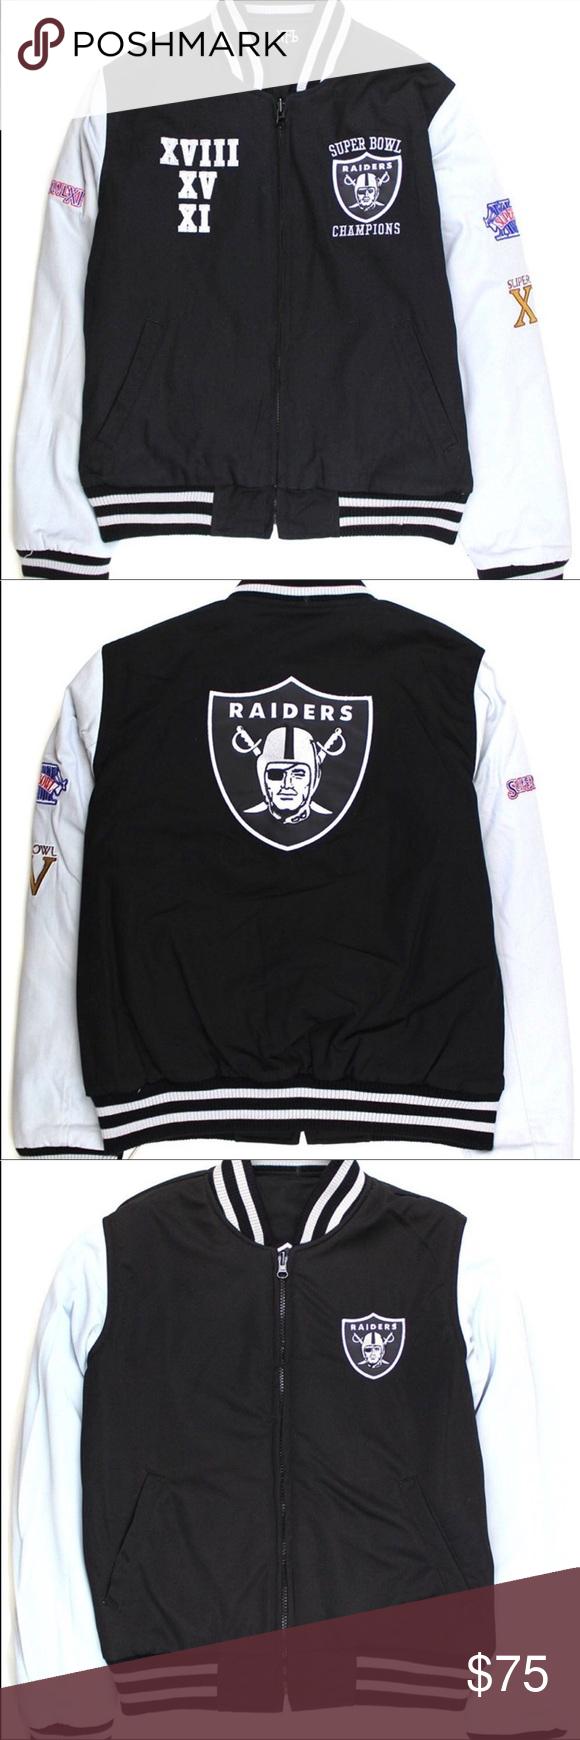 newest 5c5ef 8c0df Reversible Oakland Raiders Zip Up Jacket Reversible, Thick ...